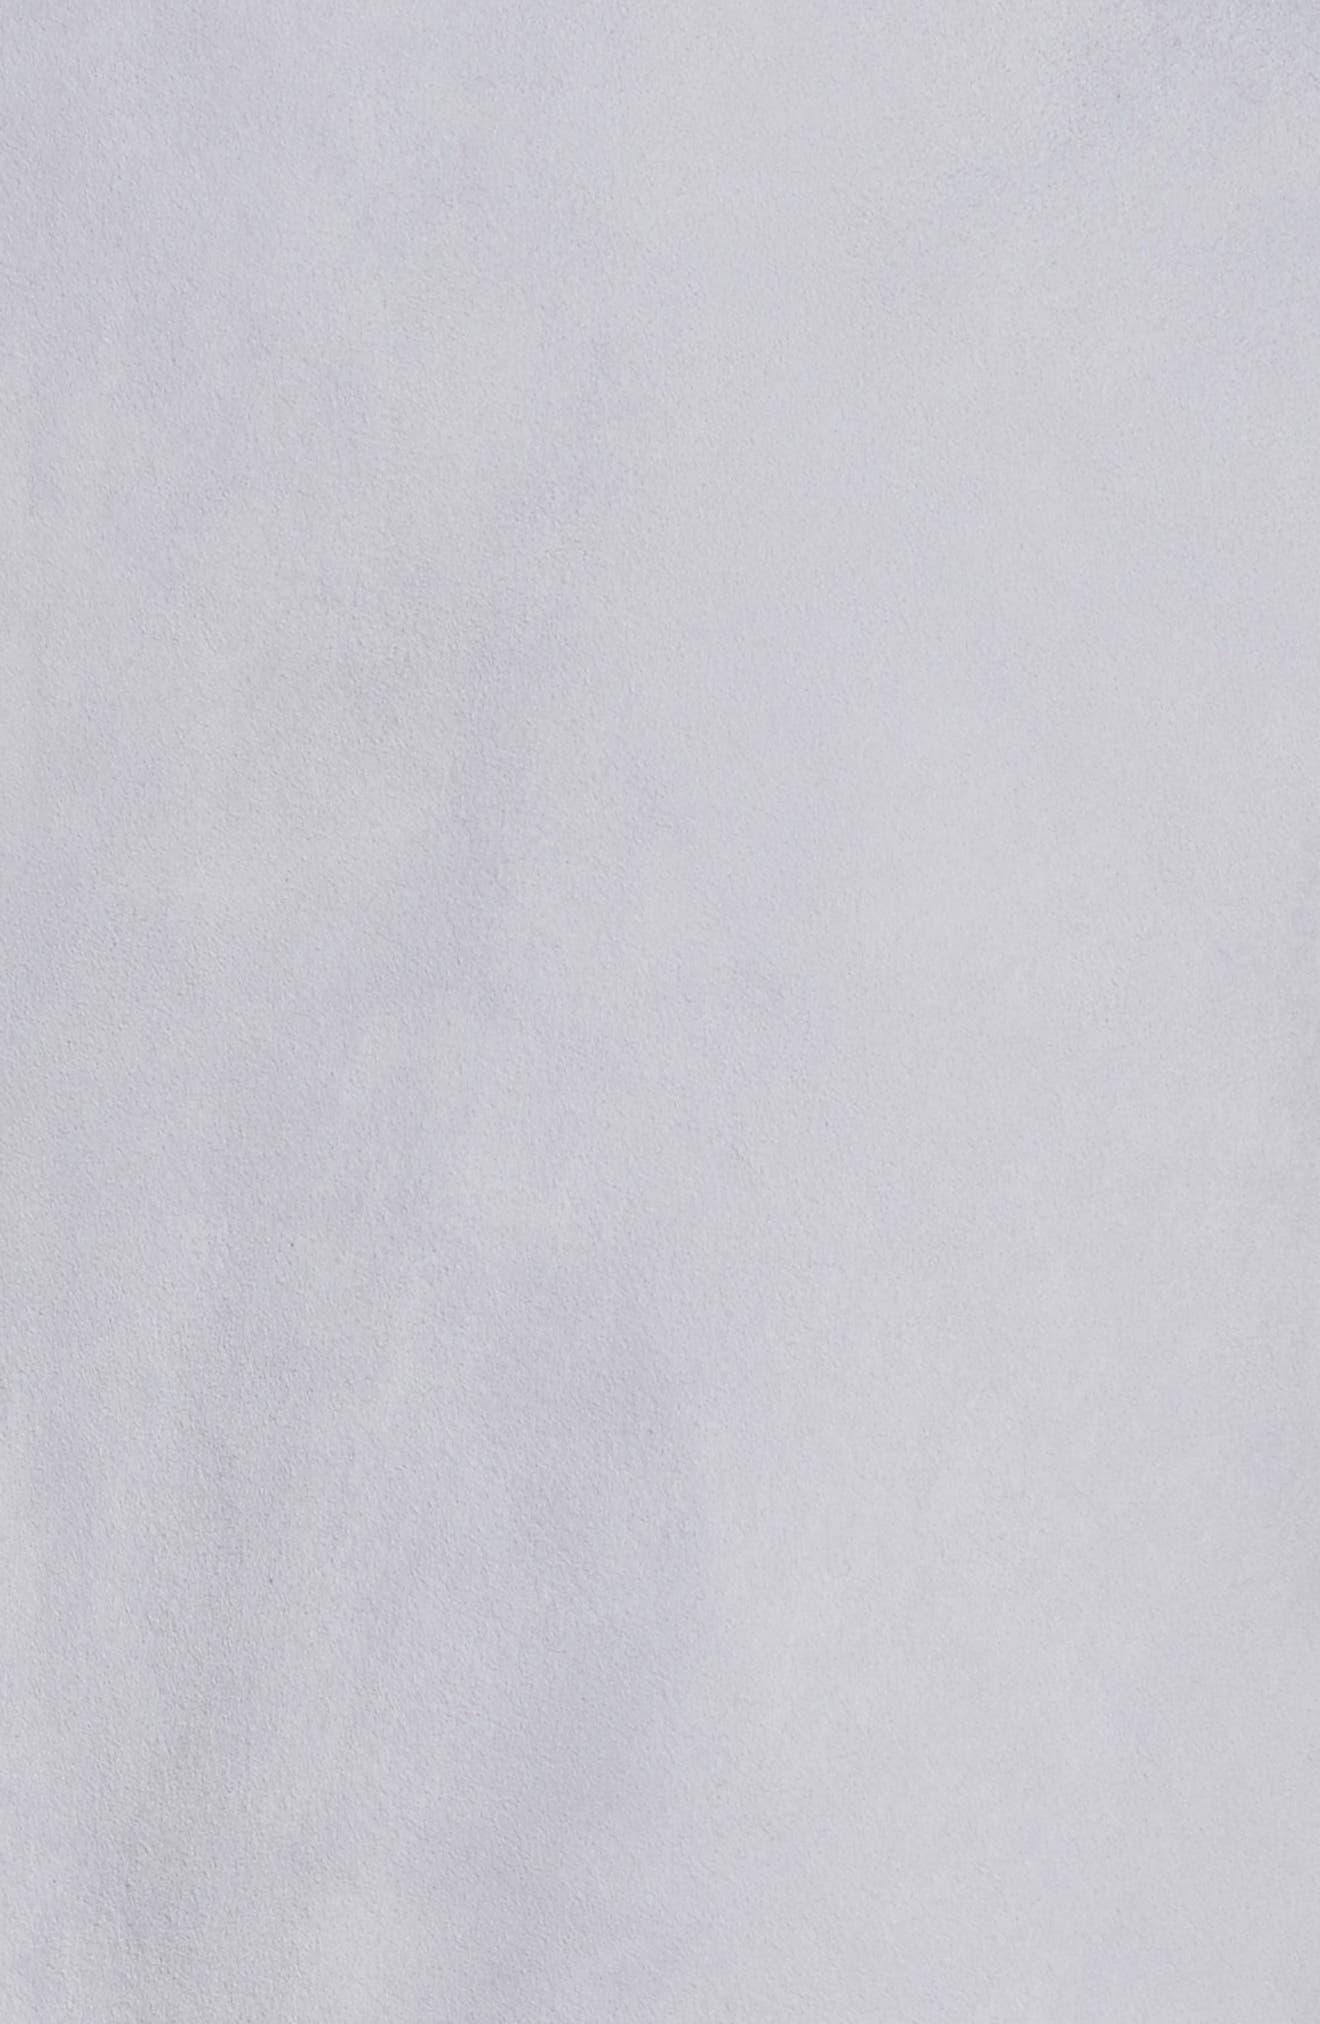 Diane von Furstenberg Patch Pocket Suede Midi Skirt,                             Alternate thumbnail 5, color,                             031